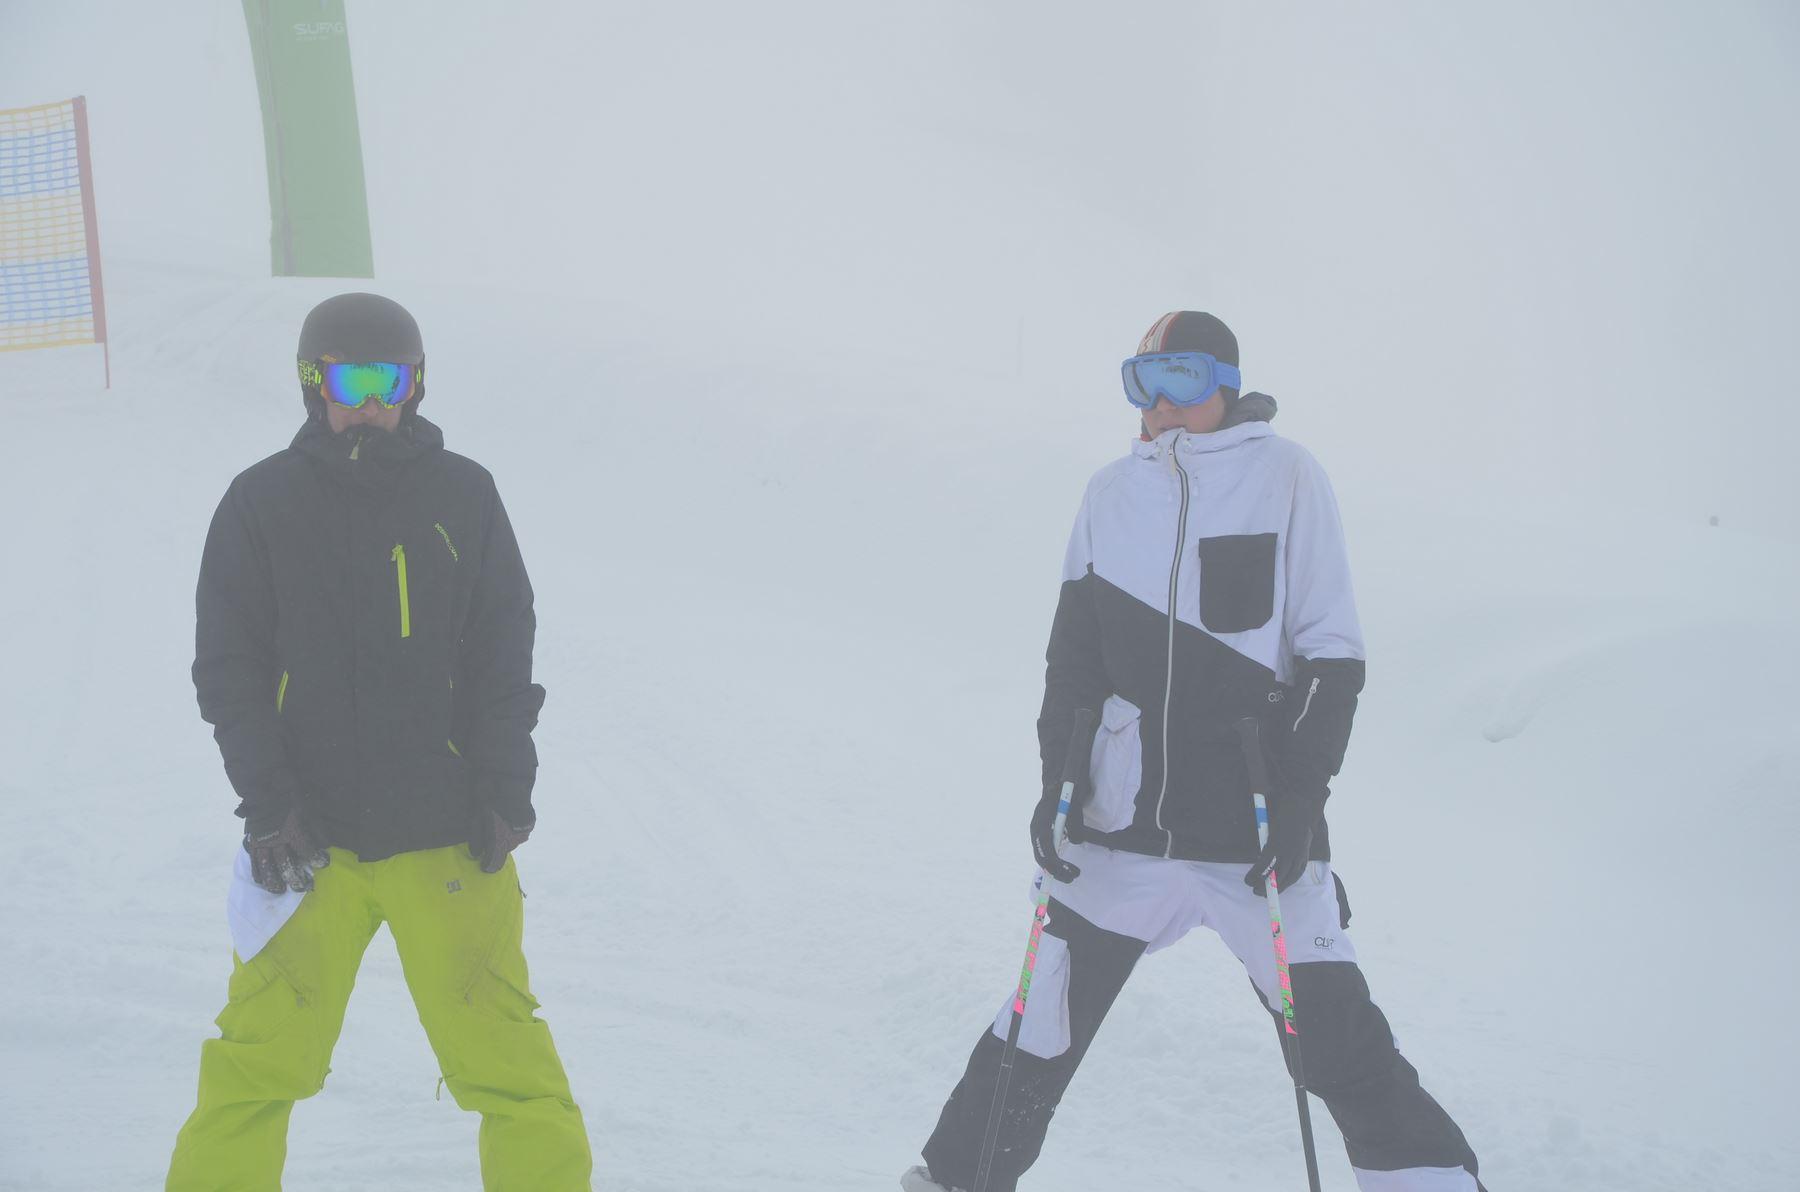 2015-03-22 BV Zillertal Skirennen 011.JPG